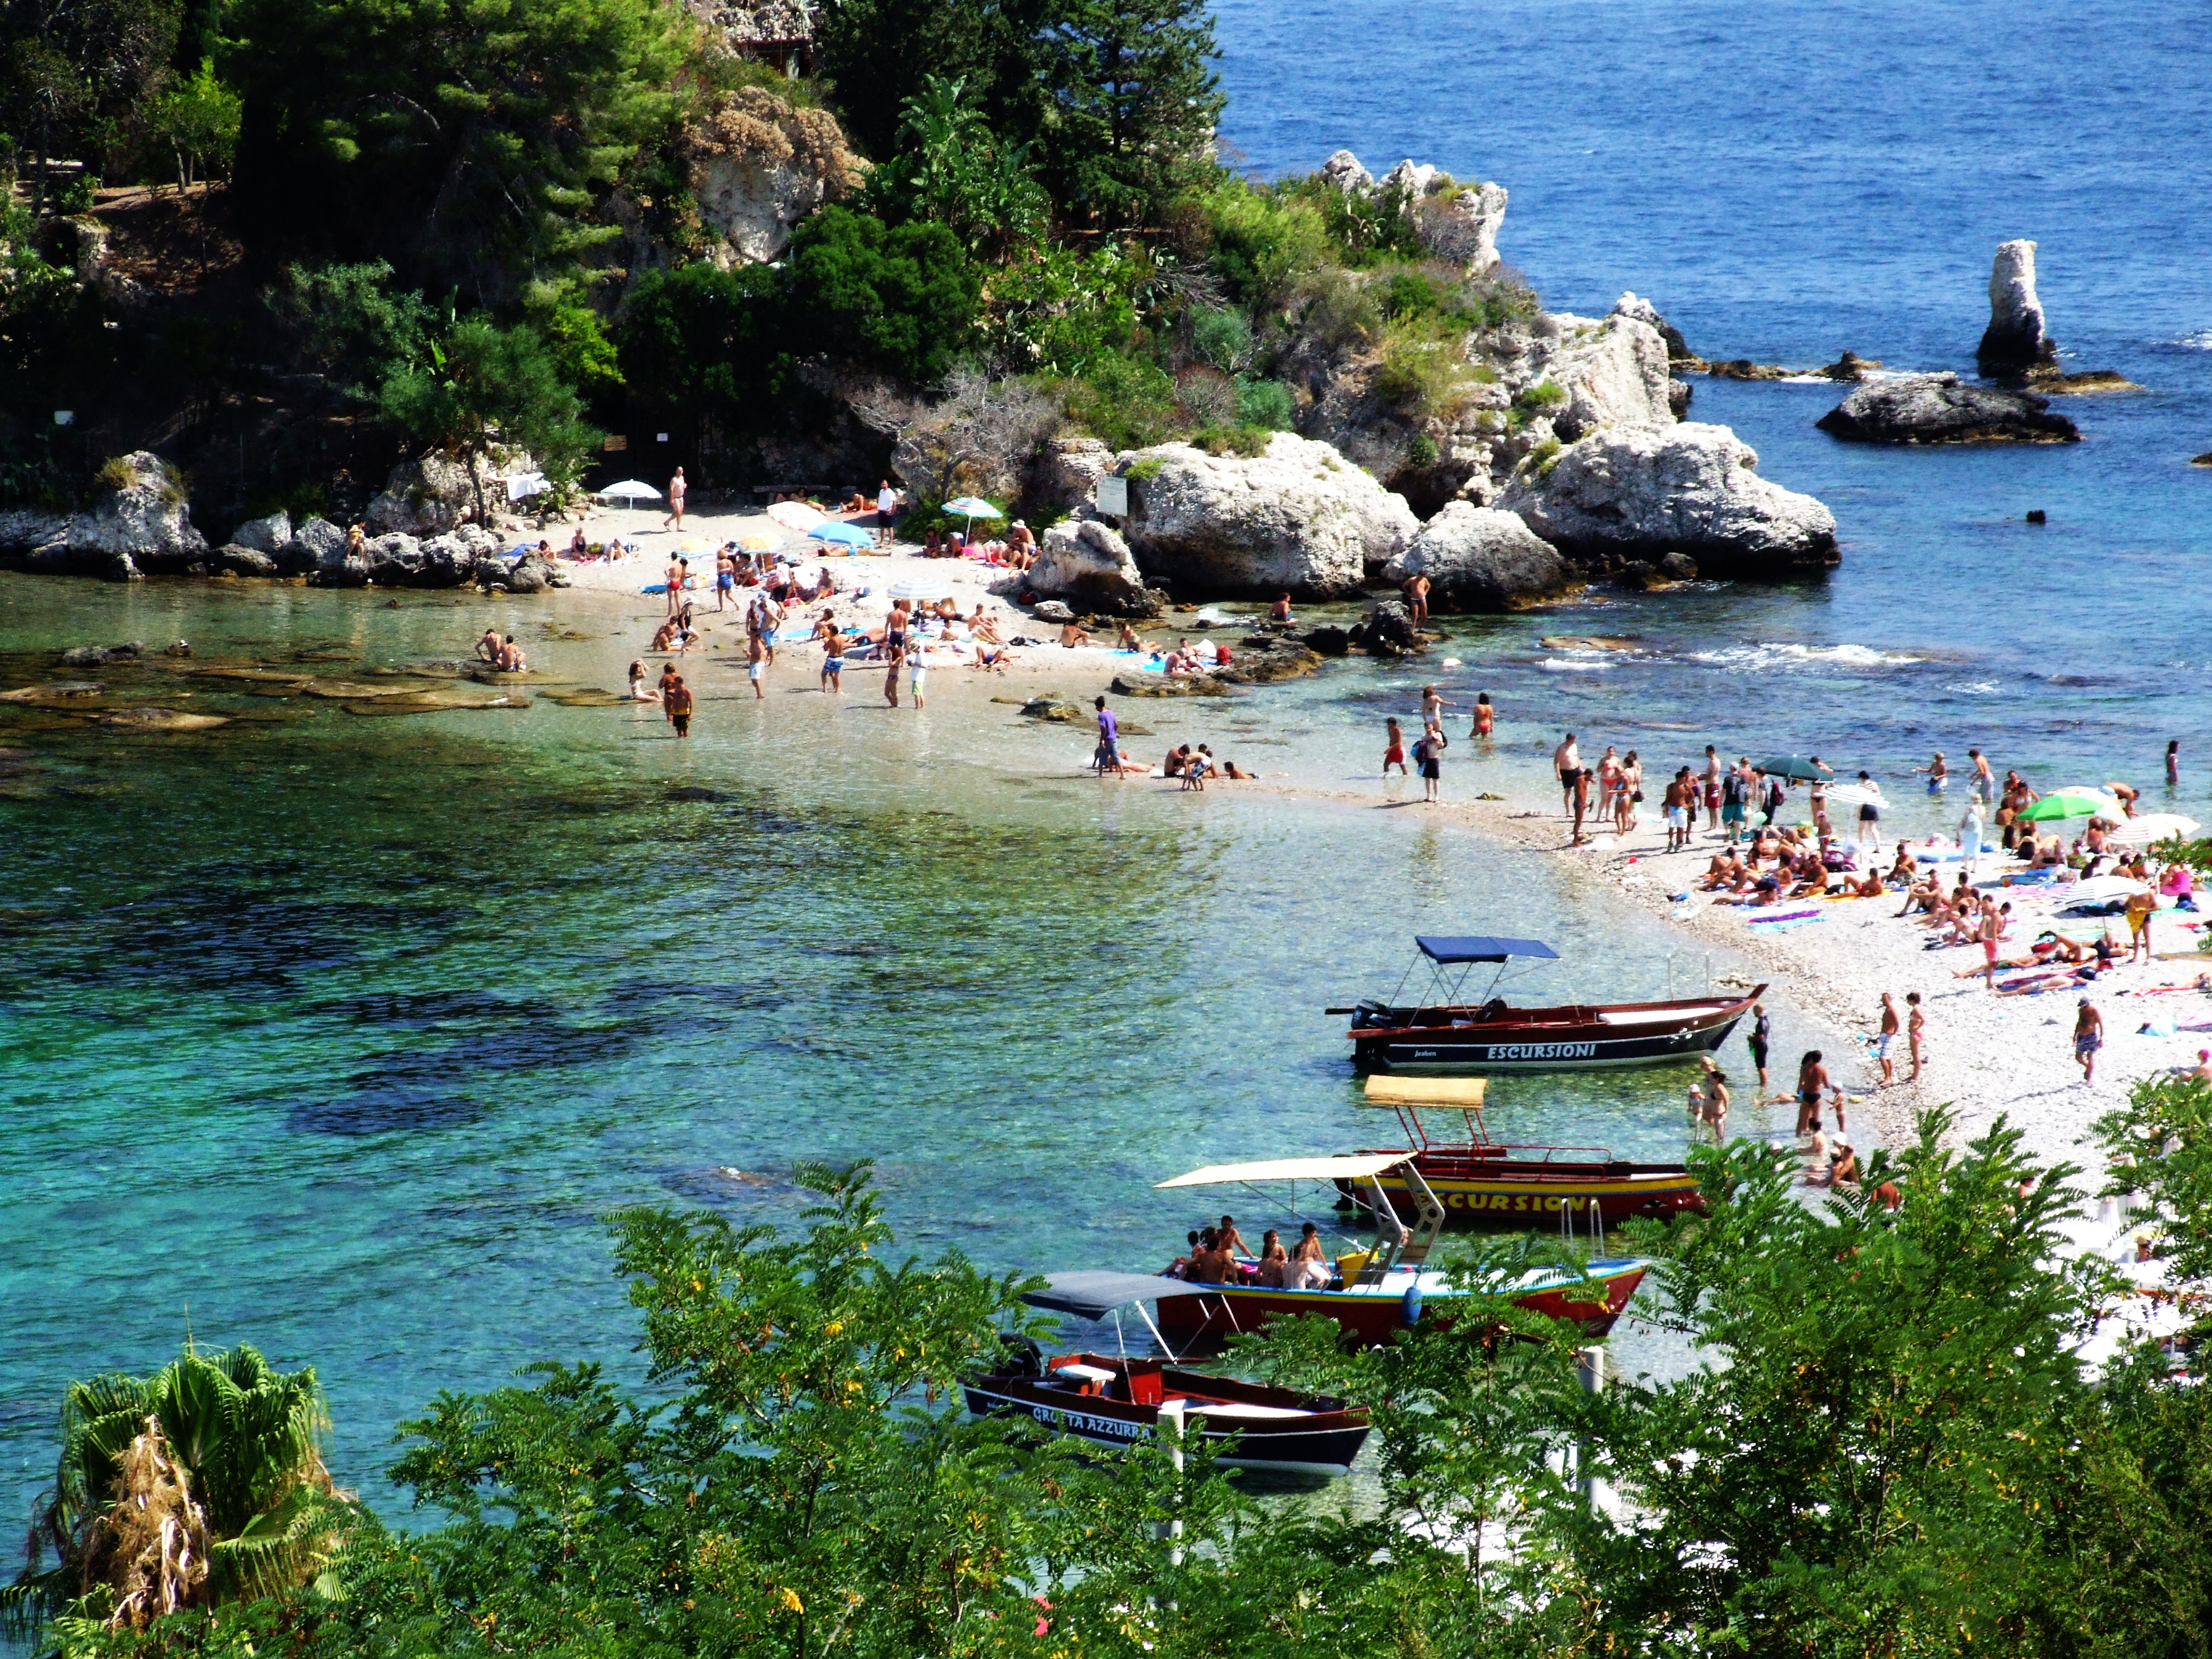 Datei isola bella taormina messina sicilia italy creative commons by gnuckx 3811732382 jpg - Giardini naxos cosa vedere ...